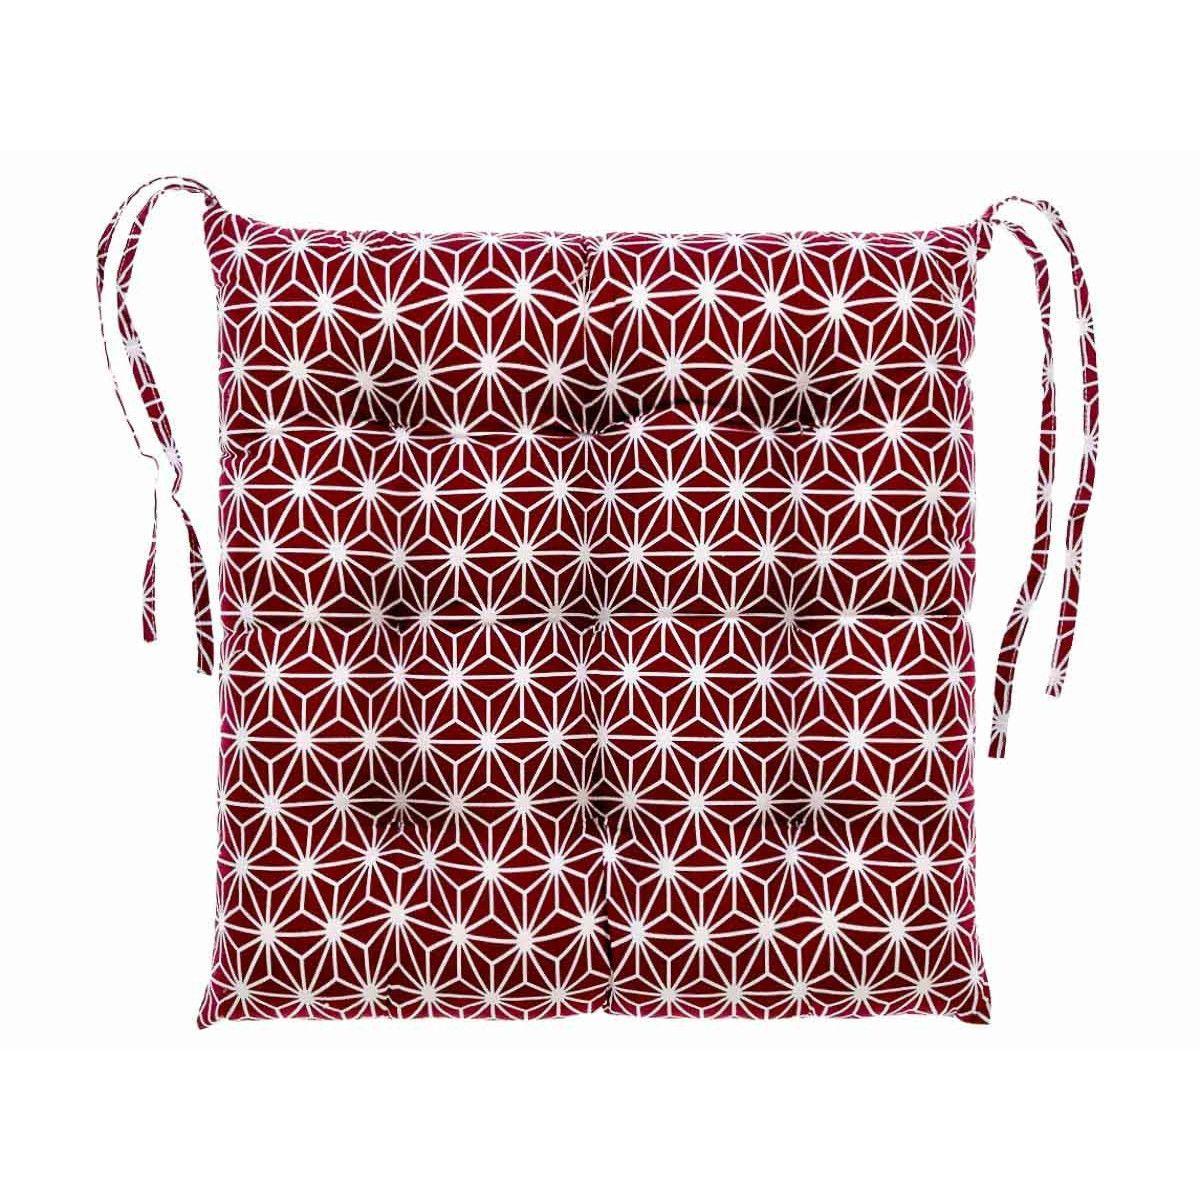 Galette de chaise Asanoha prune